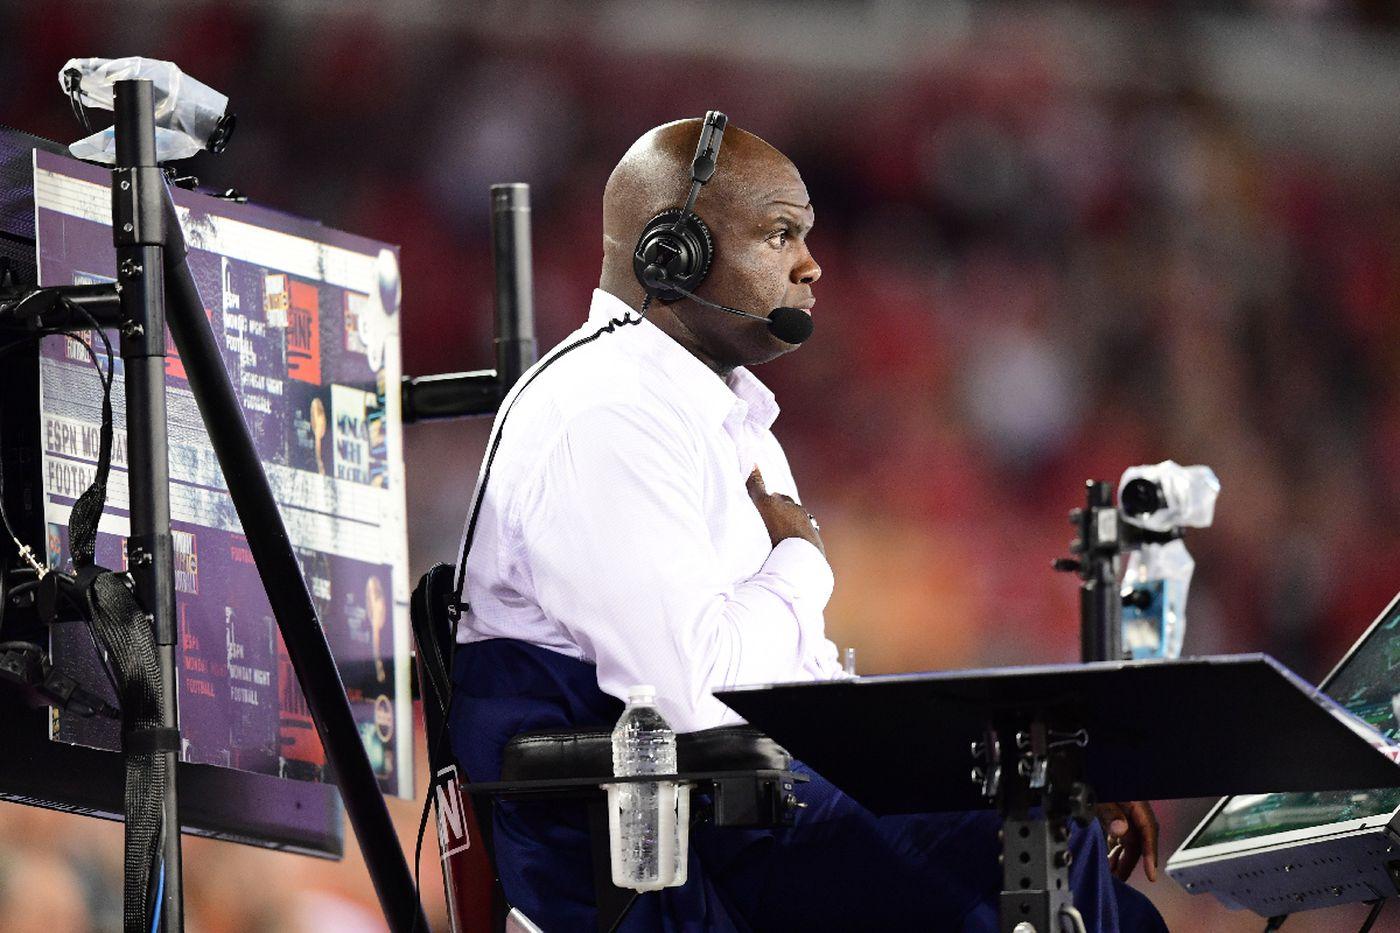 ESPN tweaks 'Monday Night Football' after fans complain